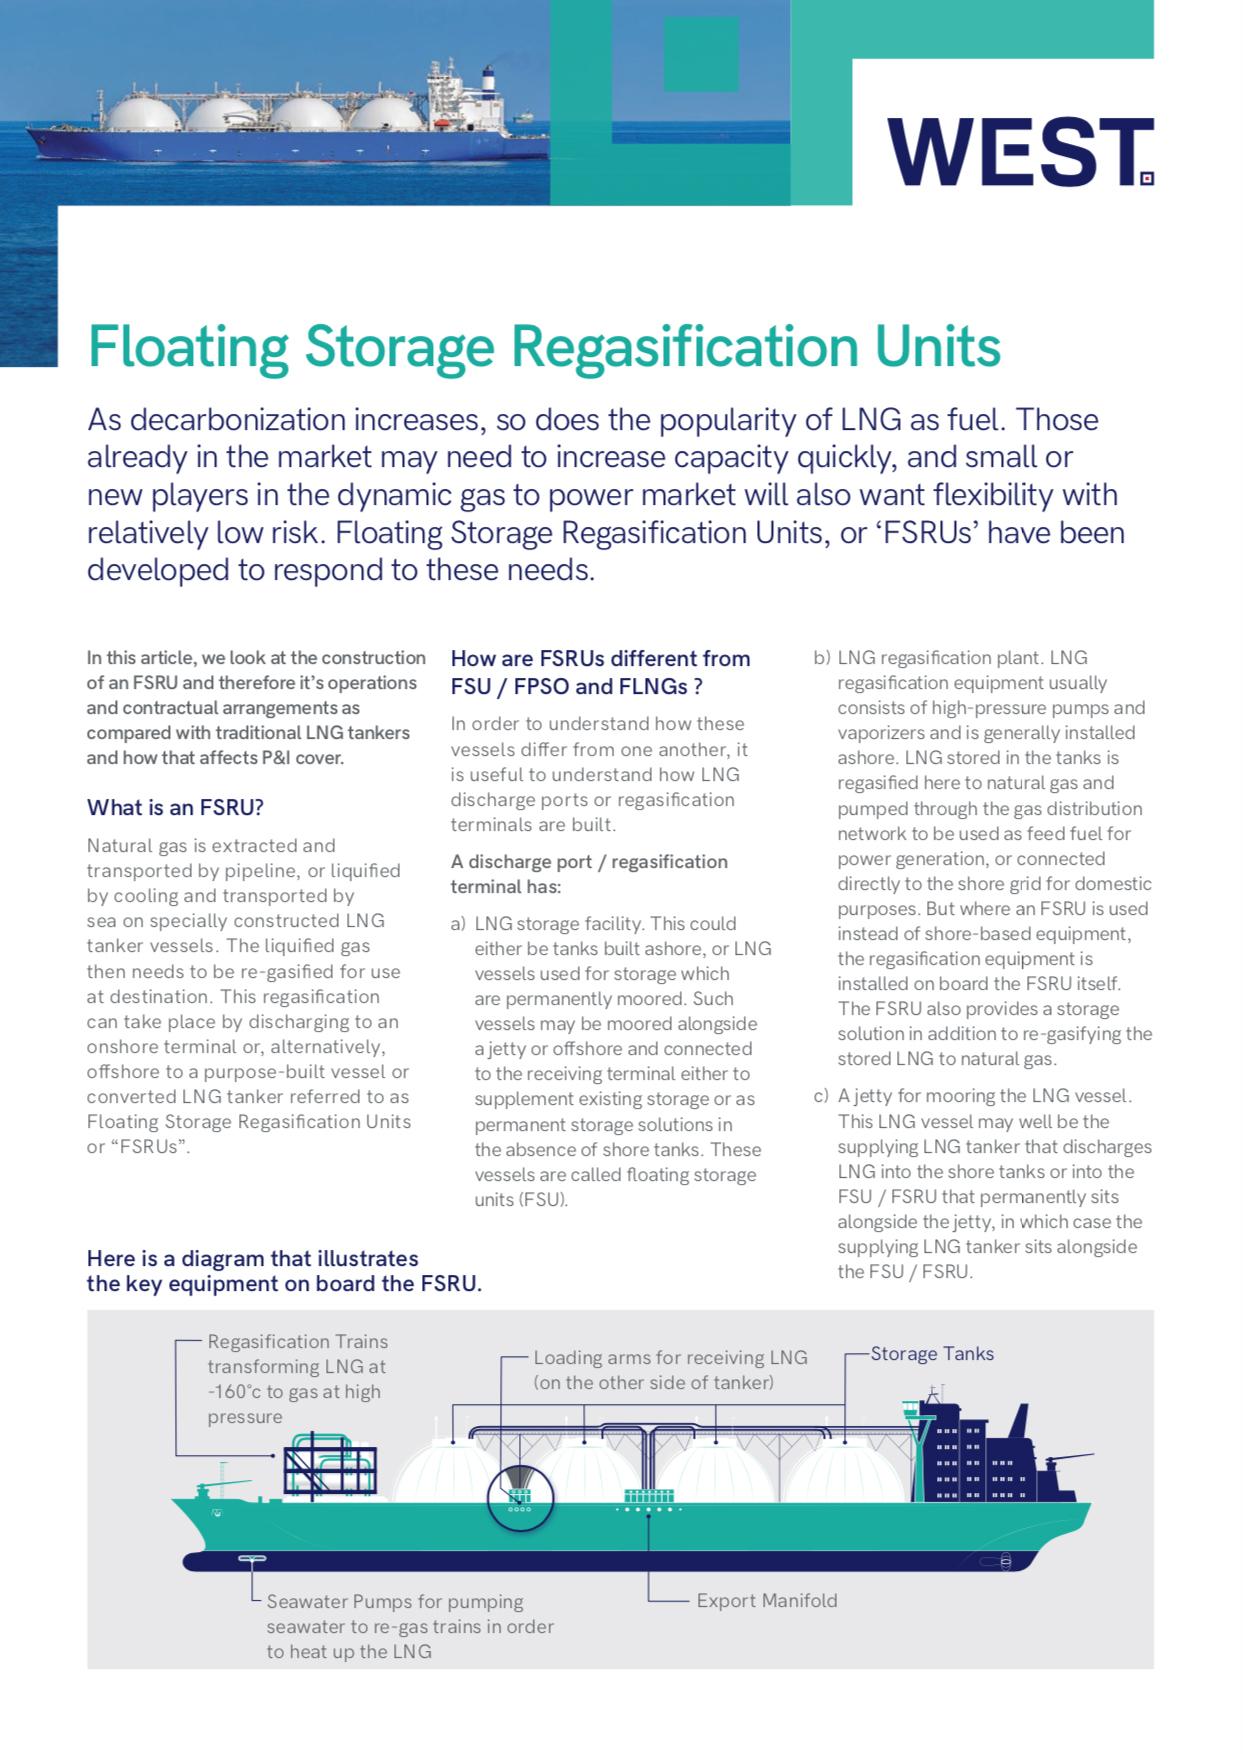 Floating-storage-regasification-image-copy